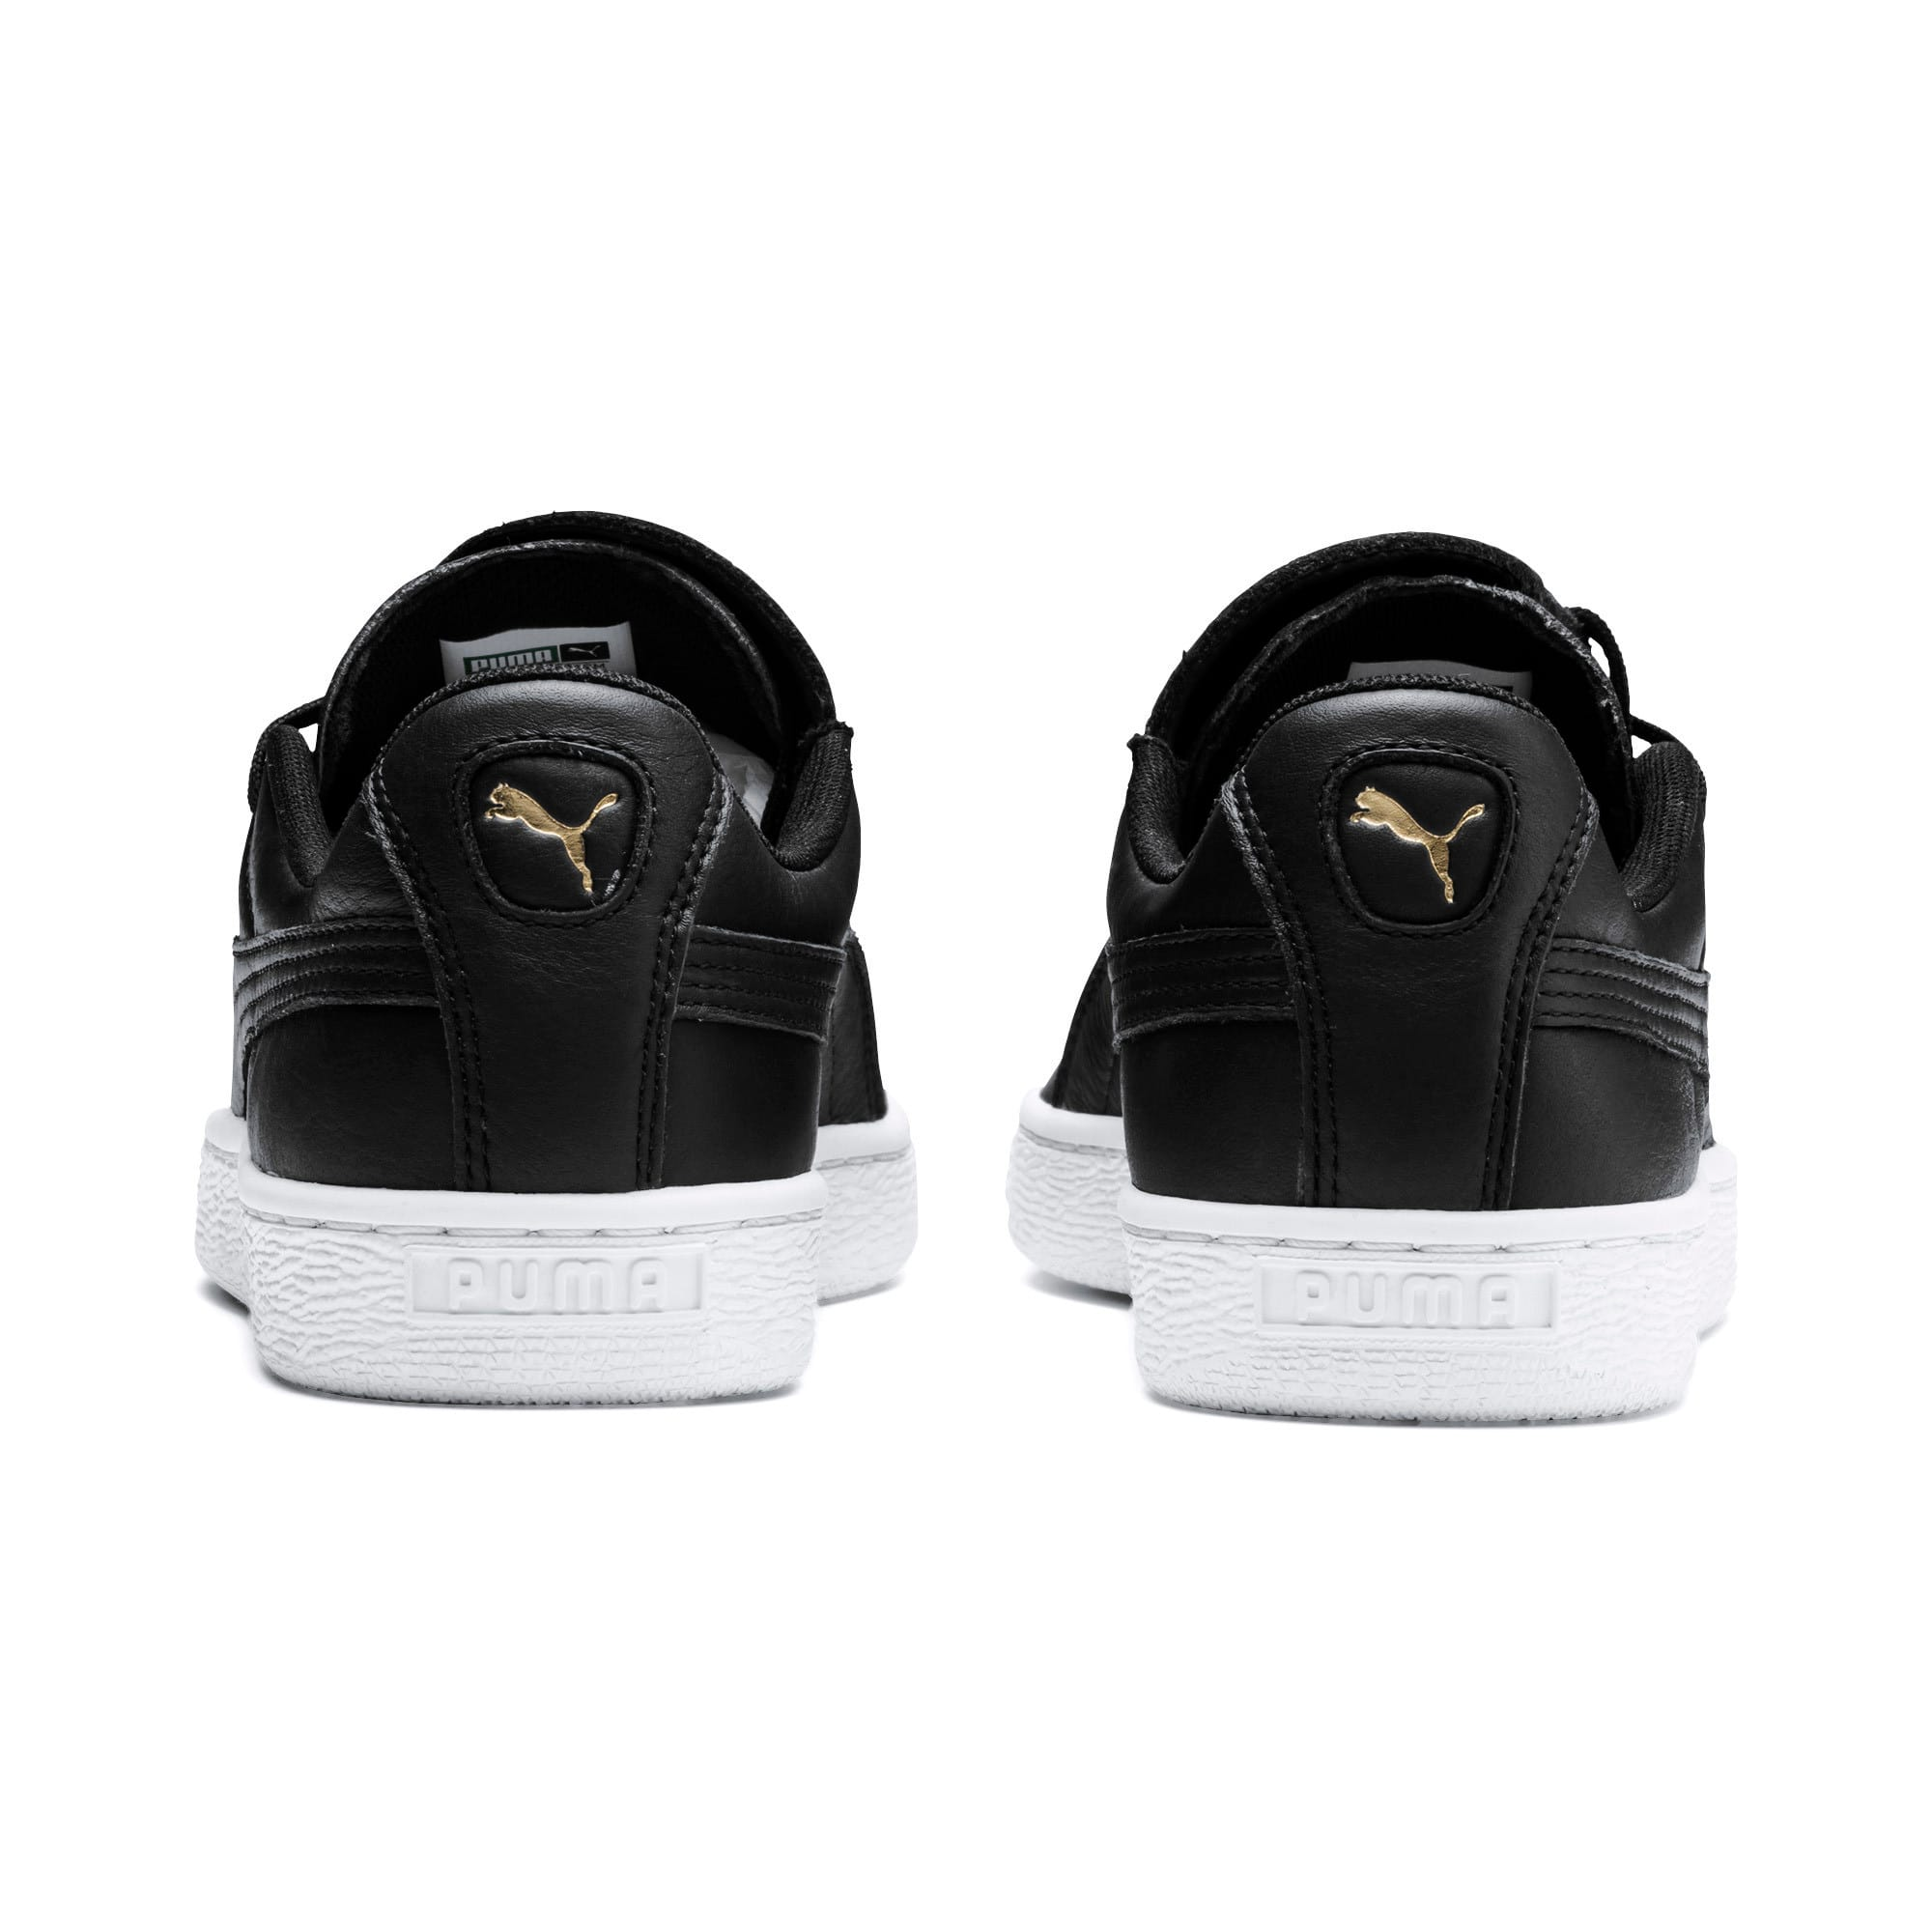 Thumbnail 3 of Basket Crush Emboss Heart Women's Sneakers, Puma Black-Puma Team Gold, medium